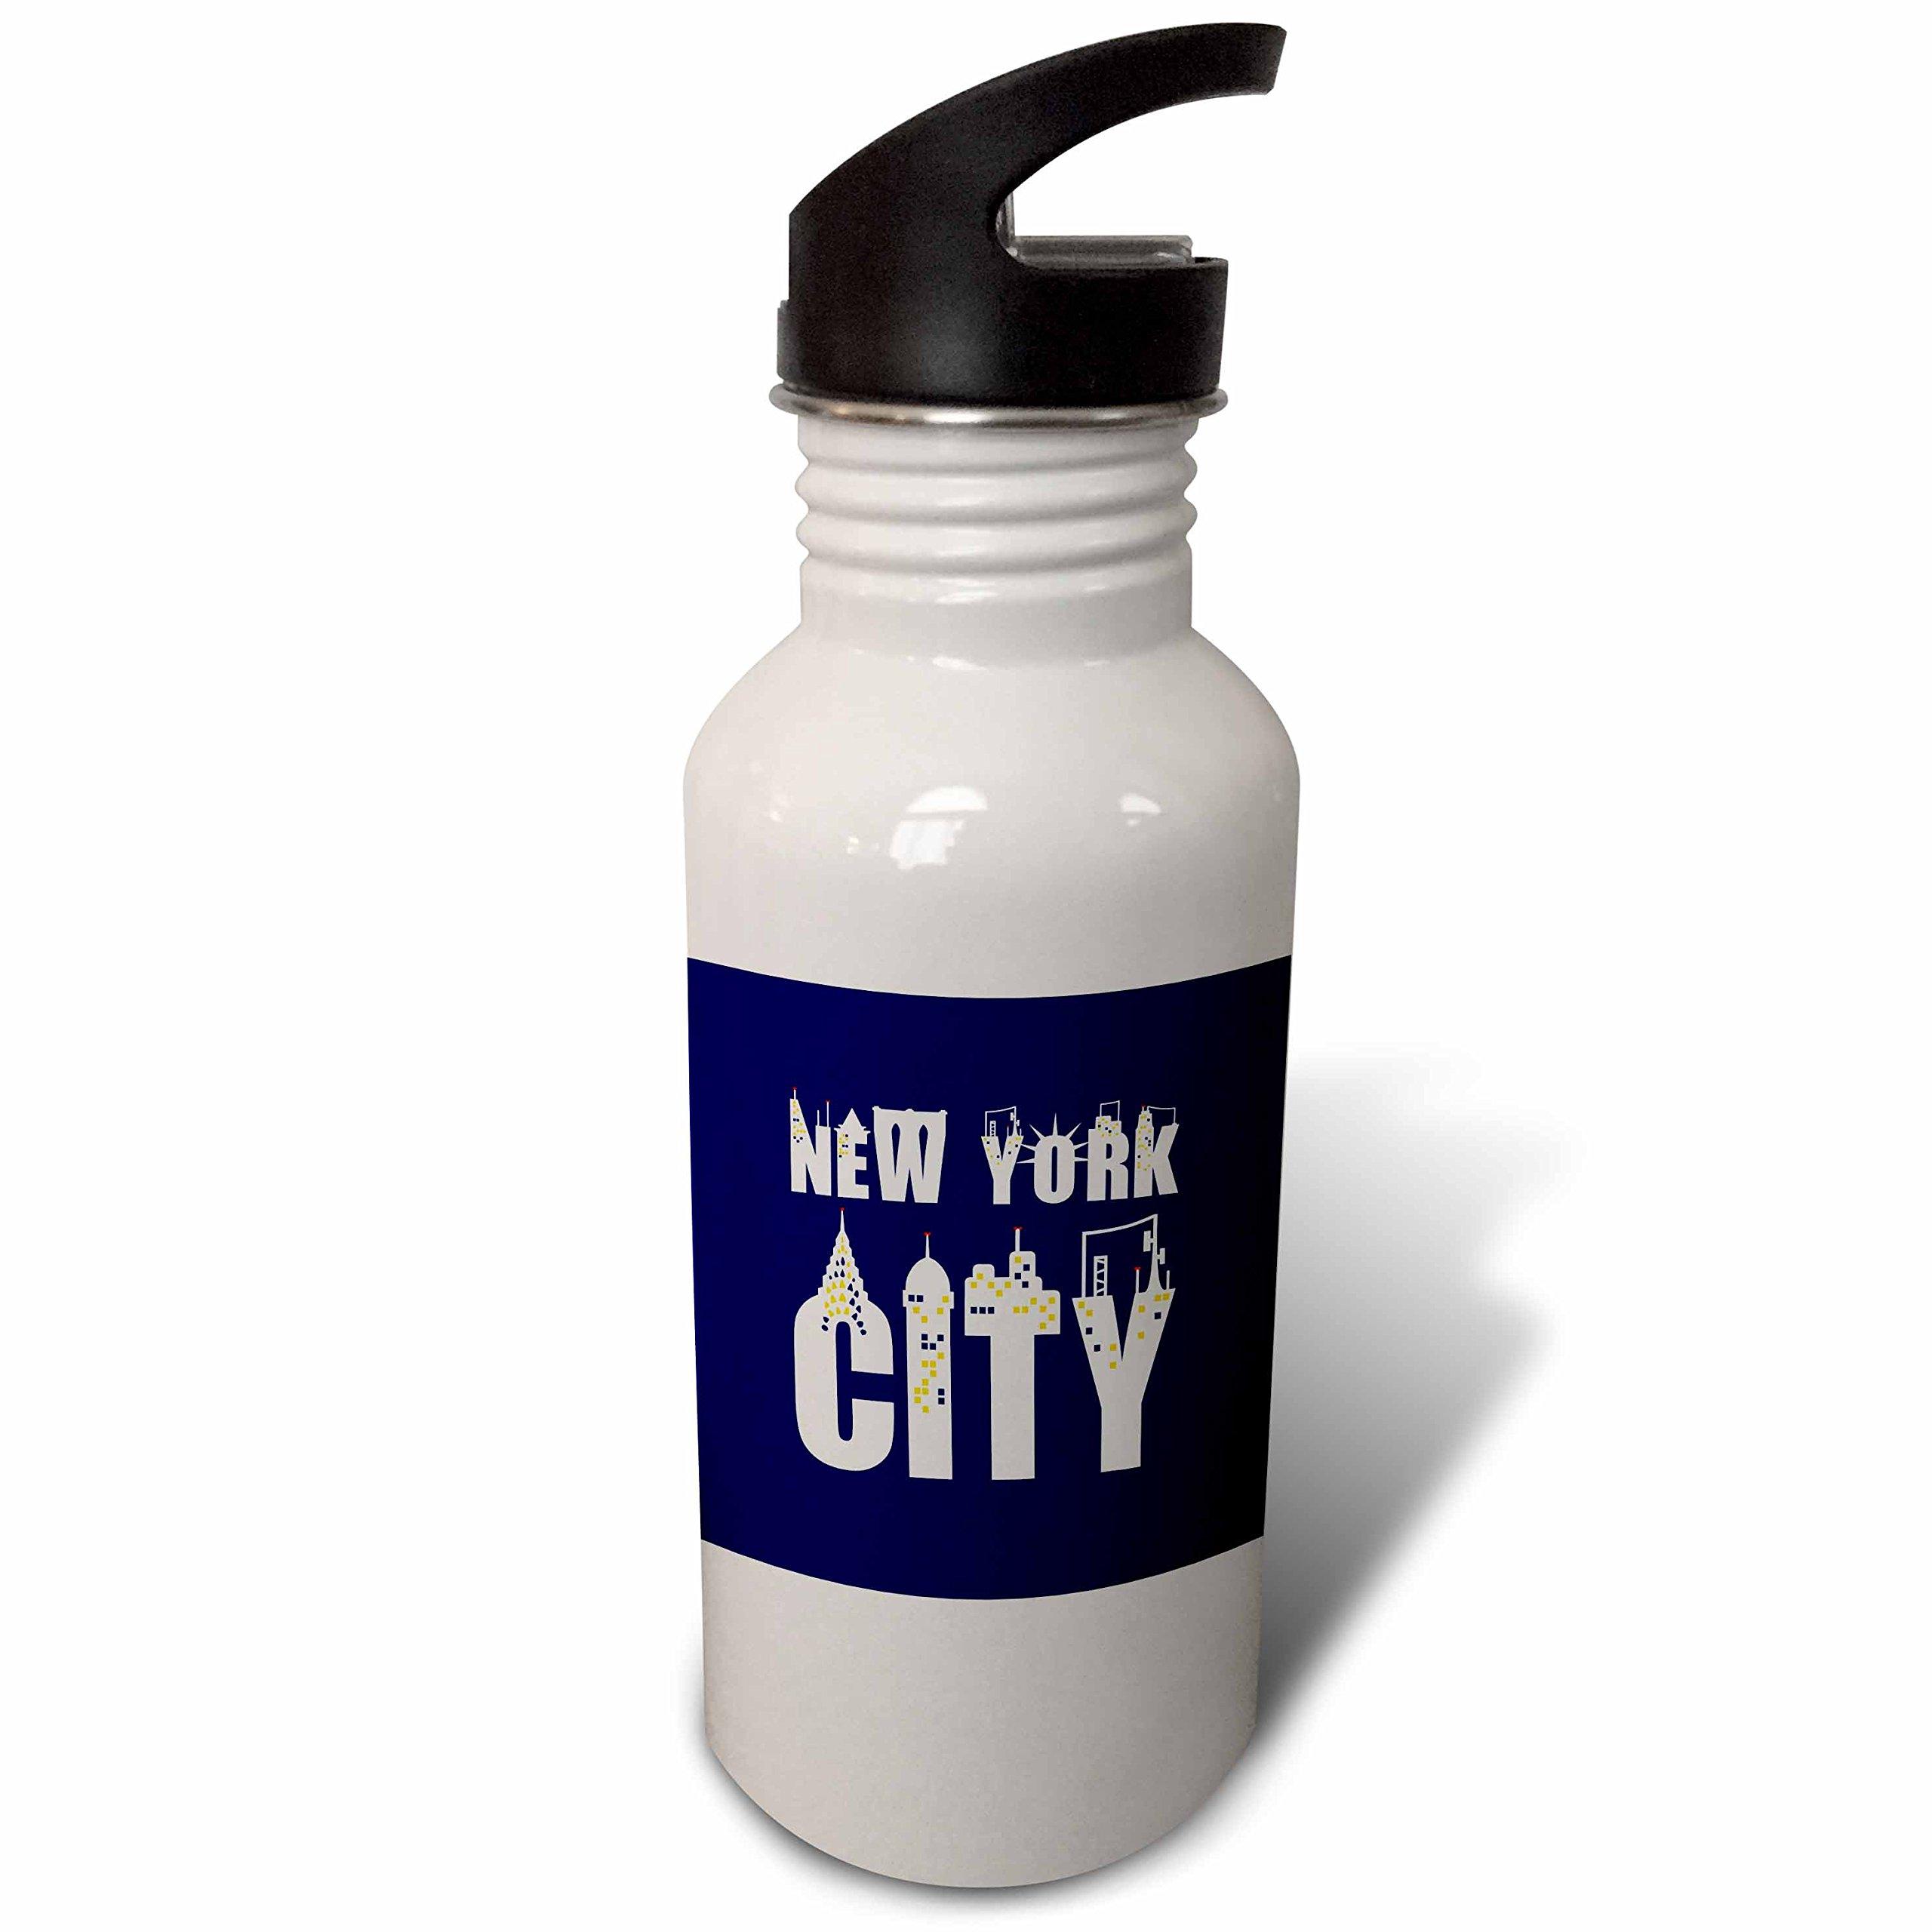 3dRose Alexis Design - American Cities - Elegant text New York City, landmarks, shining windows on blue - Flip Straw 21oz Water Bottle (wb_286455_2)